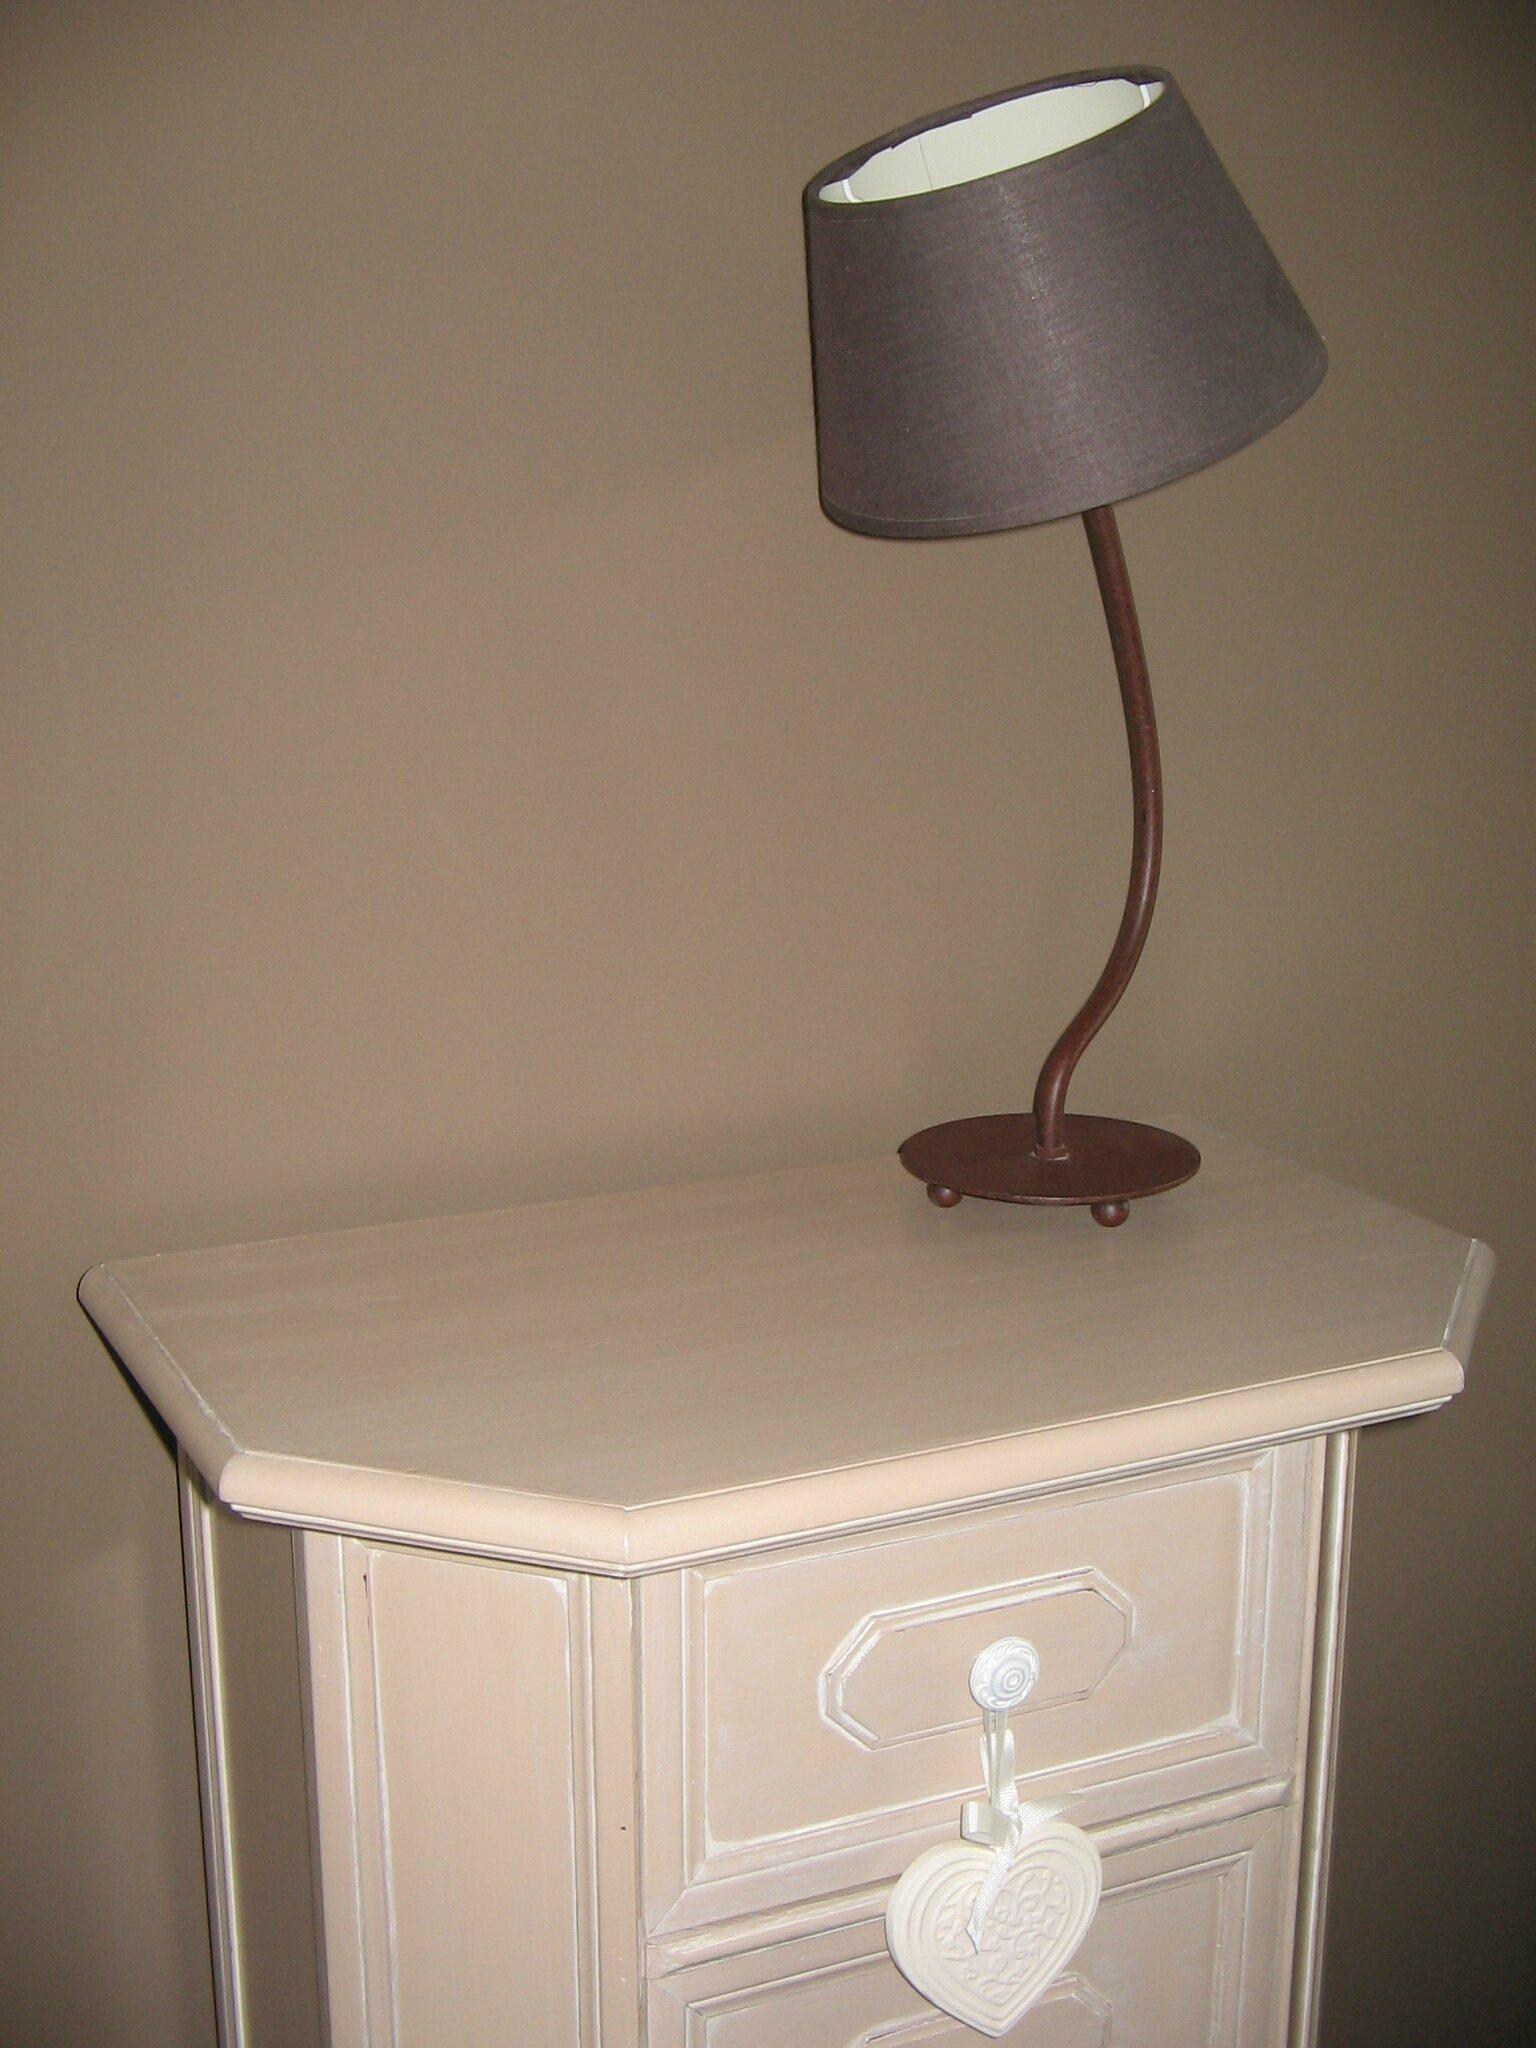 petit meuble d 39 entr e relooking de meubles nadr nov. Black Bedroom Furniture Sets. Home Design Ideas